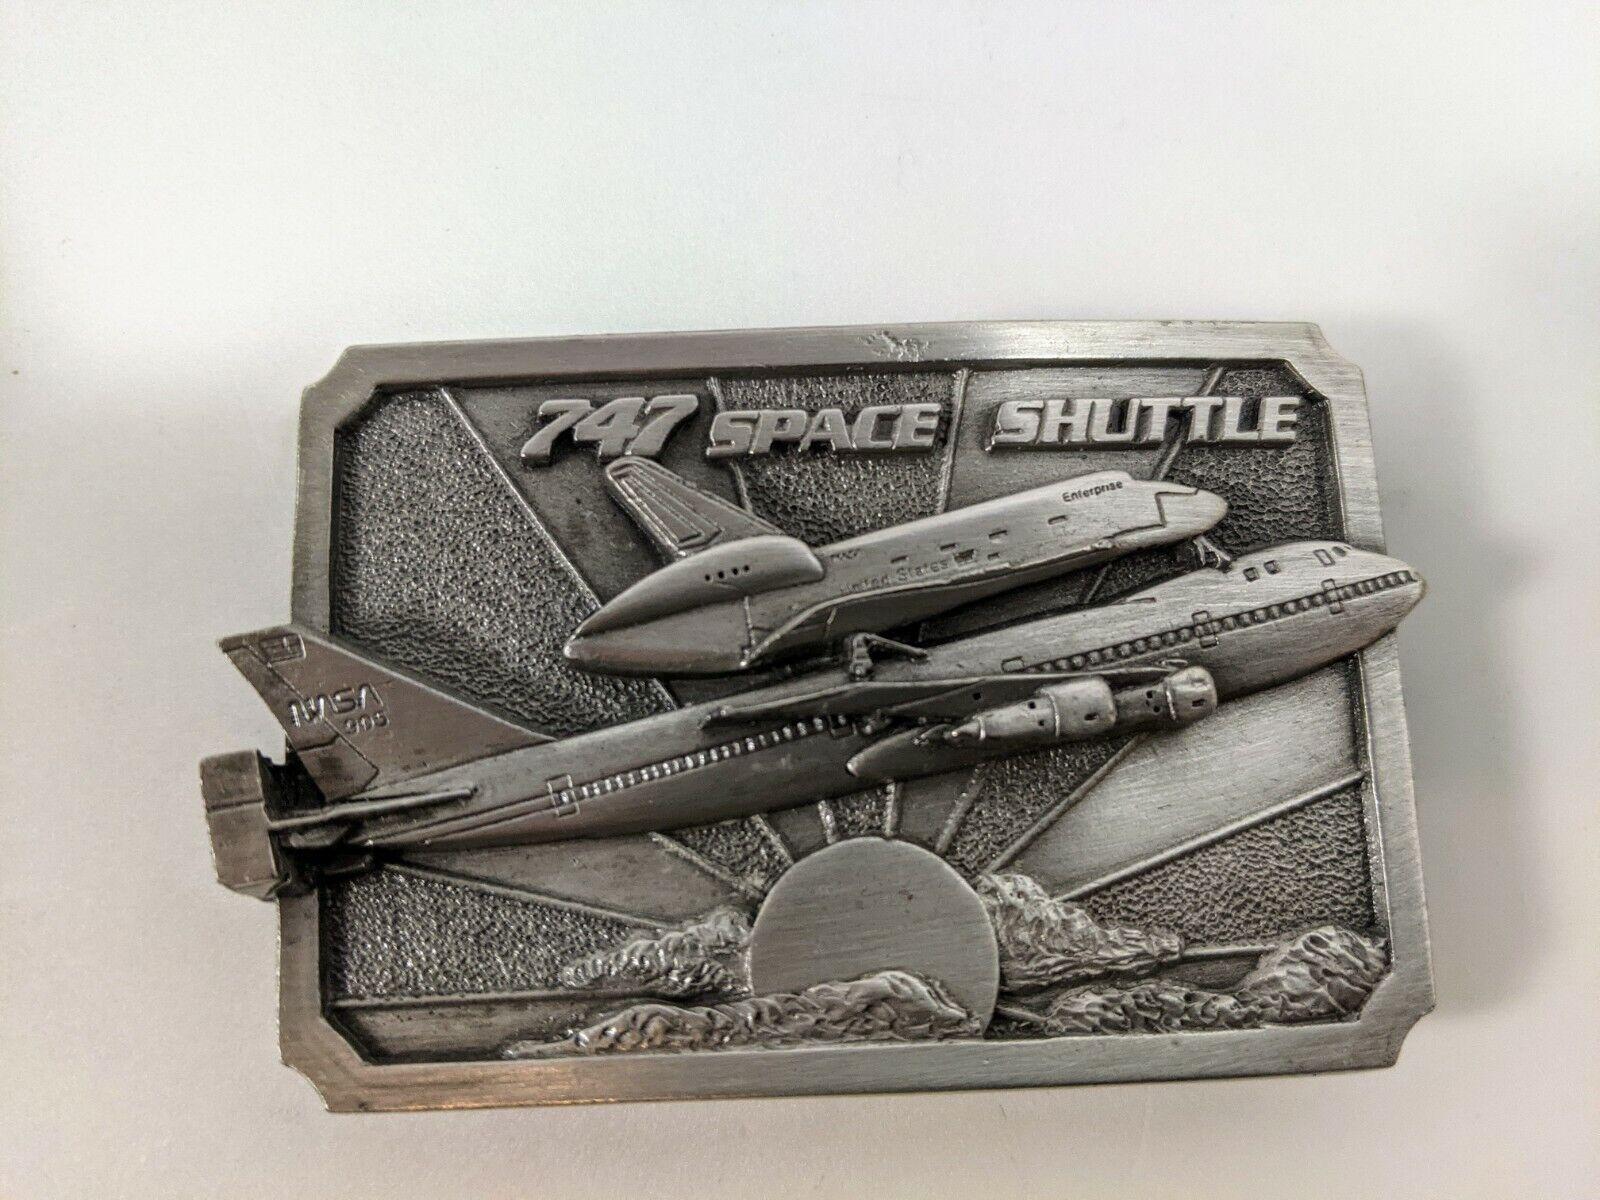 Boeing 747 Space Shuttle NASA Enterprise Belt Buckle 1983 Aviation by Siskiyou